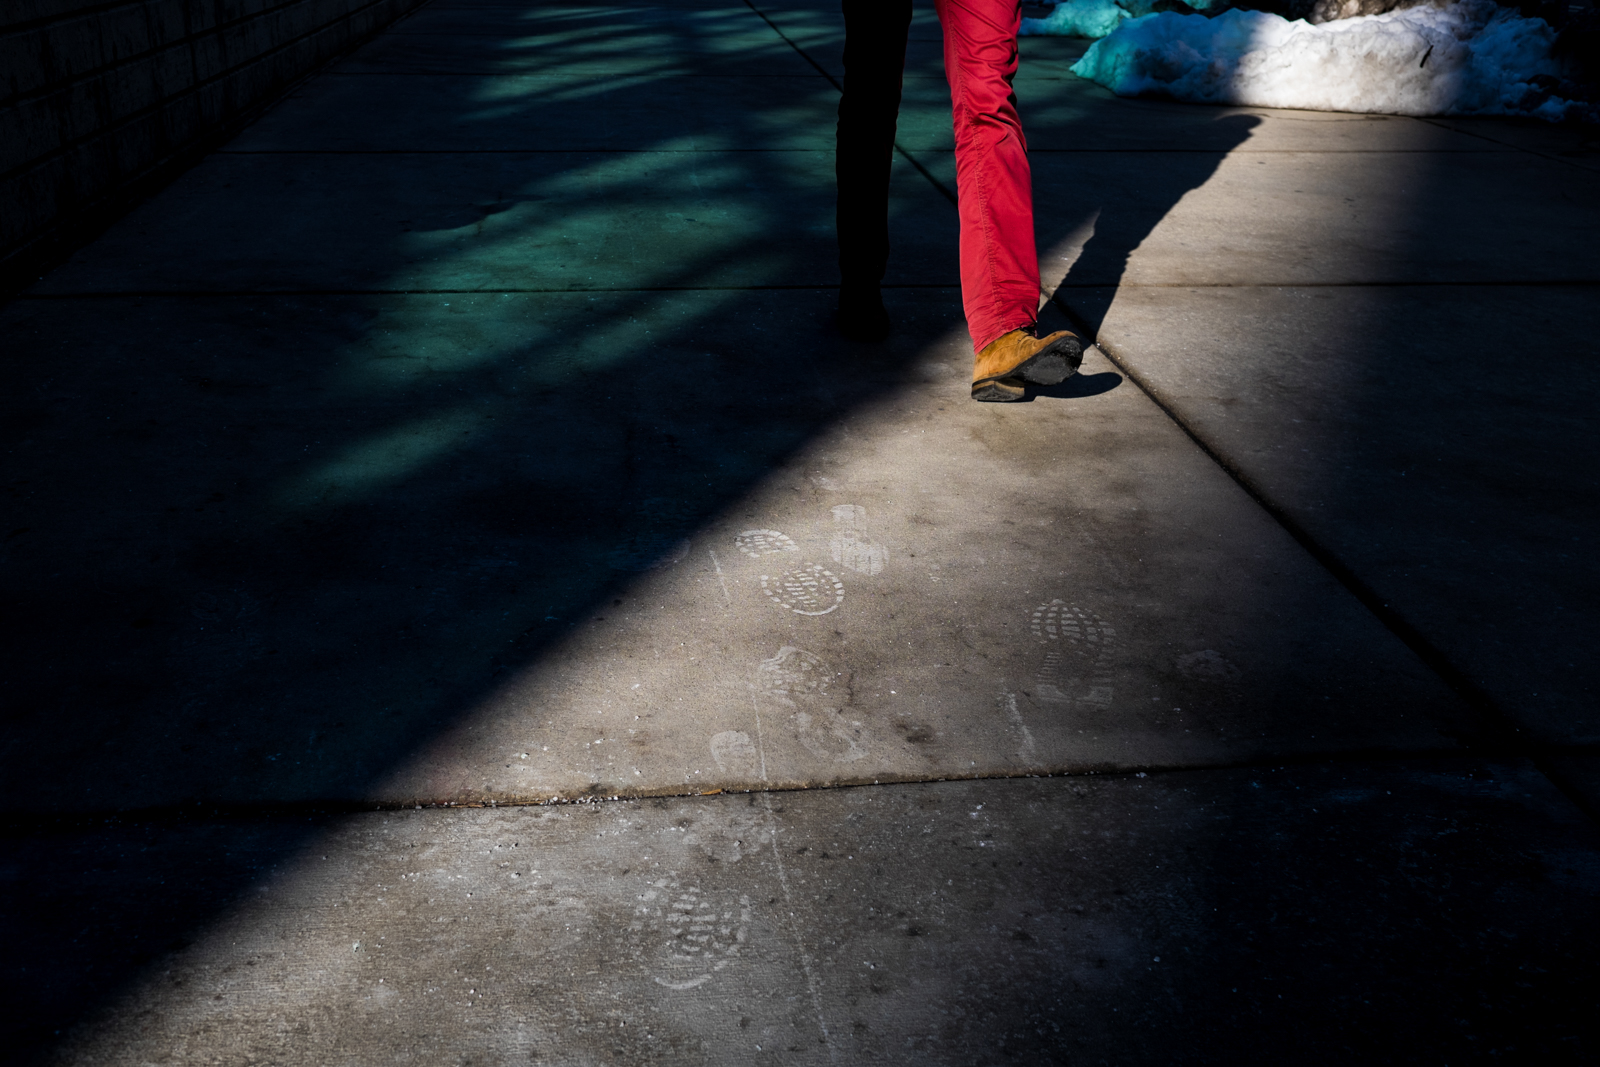 gregory bethmann_street photographer-25.jpg